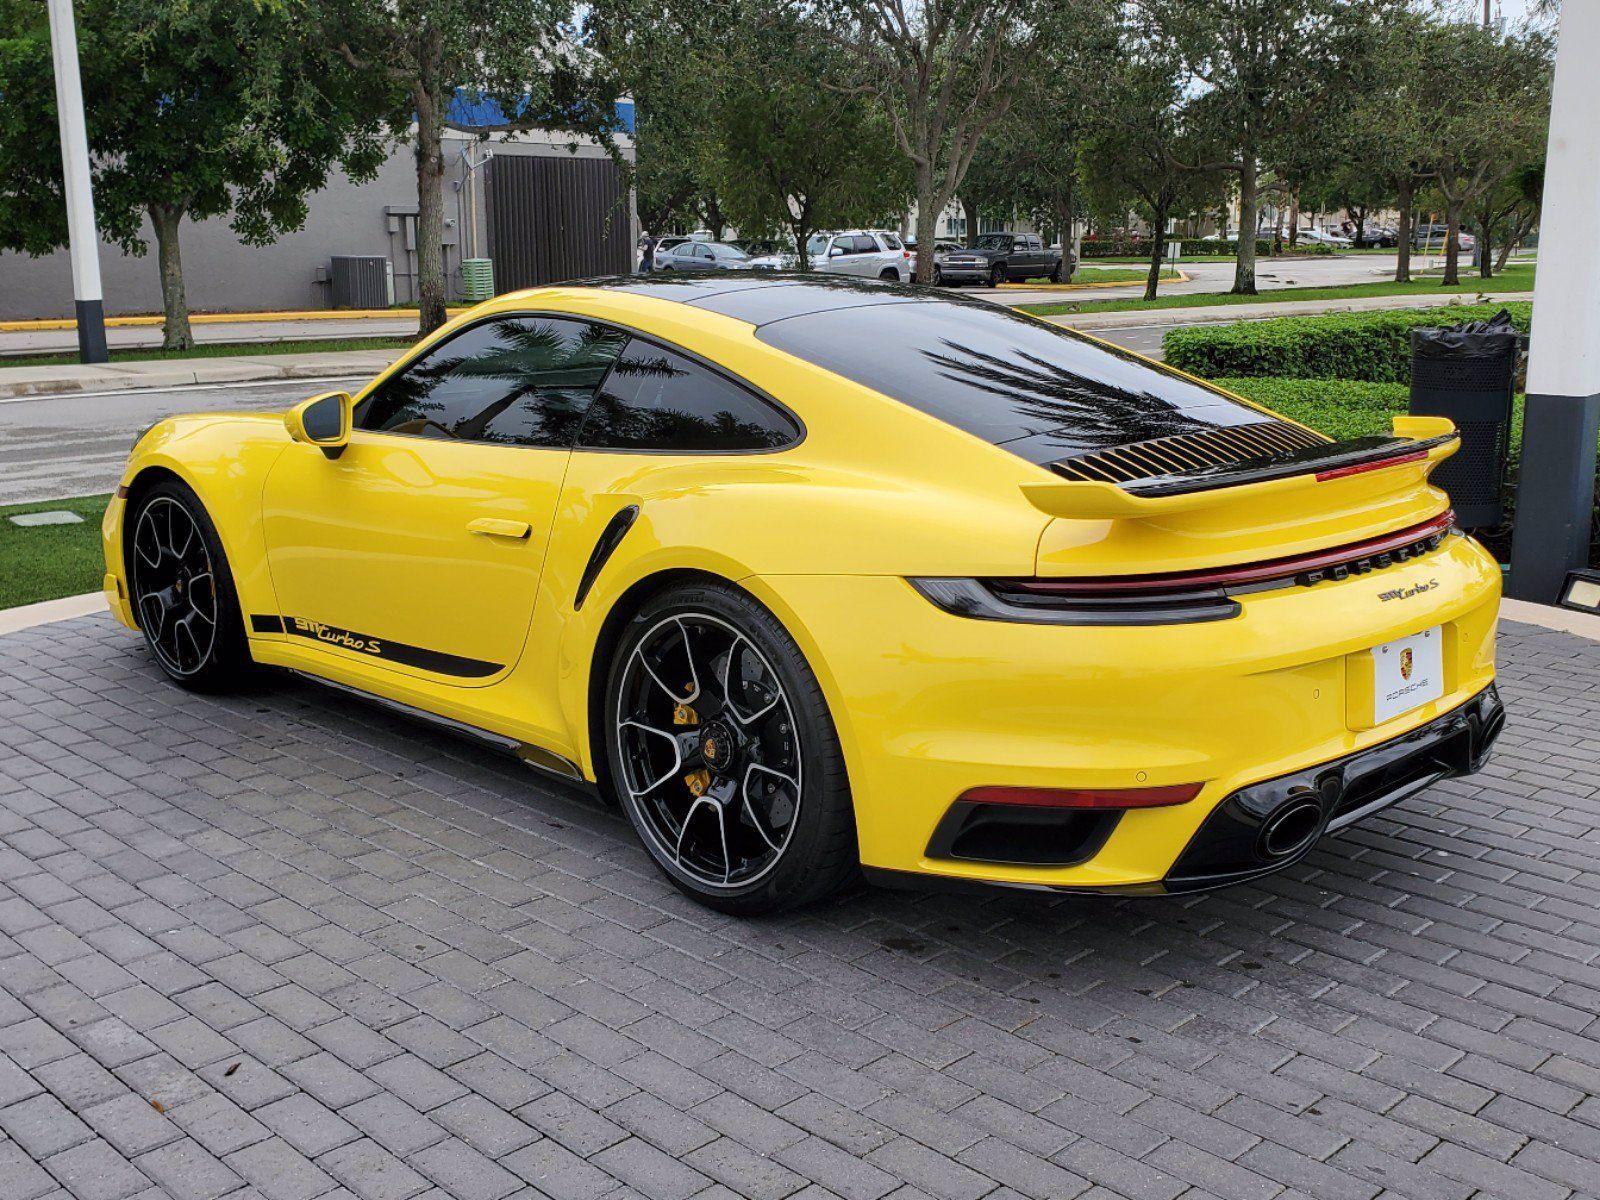 2021 Porsche 911 Turbo S – 3